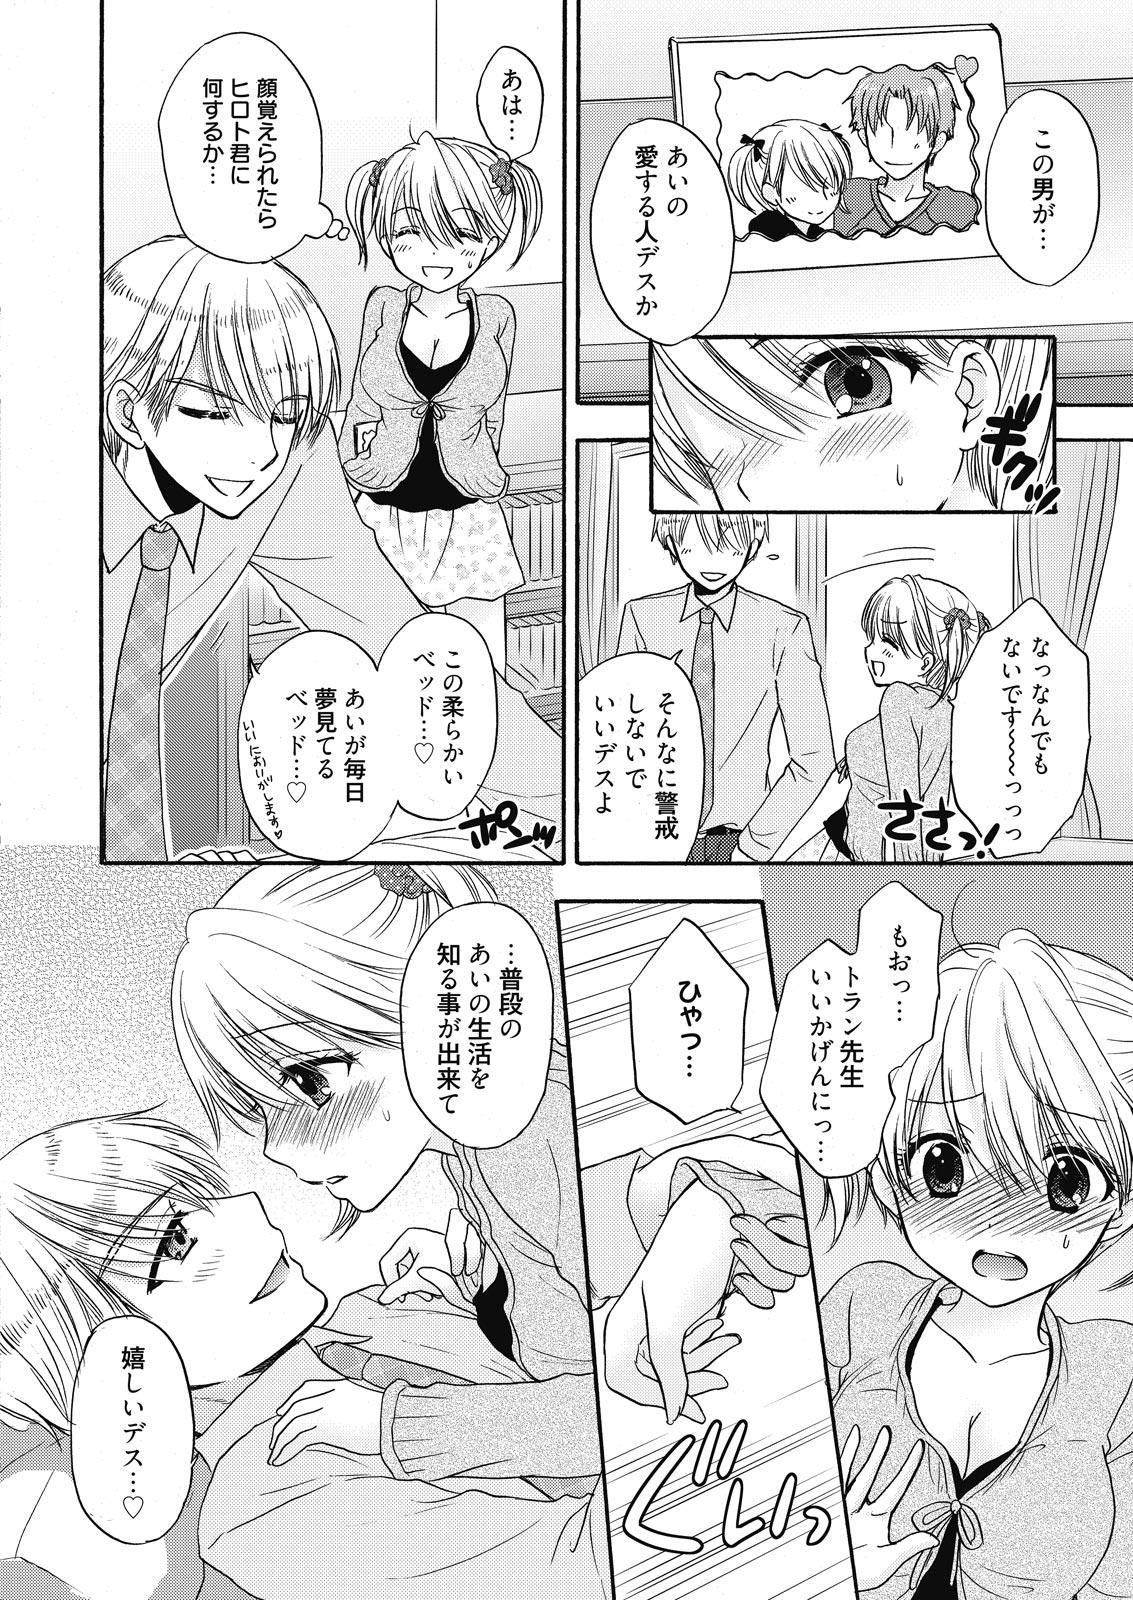 Web Manga Bangaichi Vol. 7 33